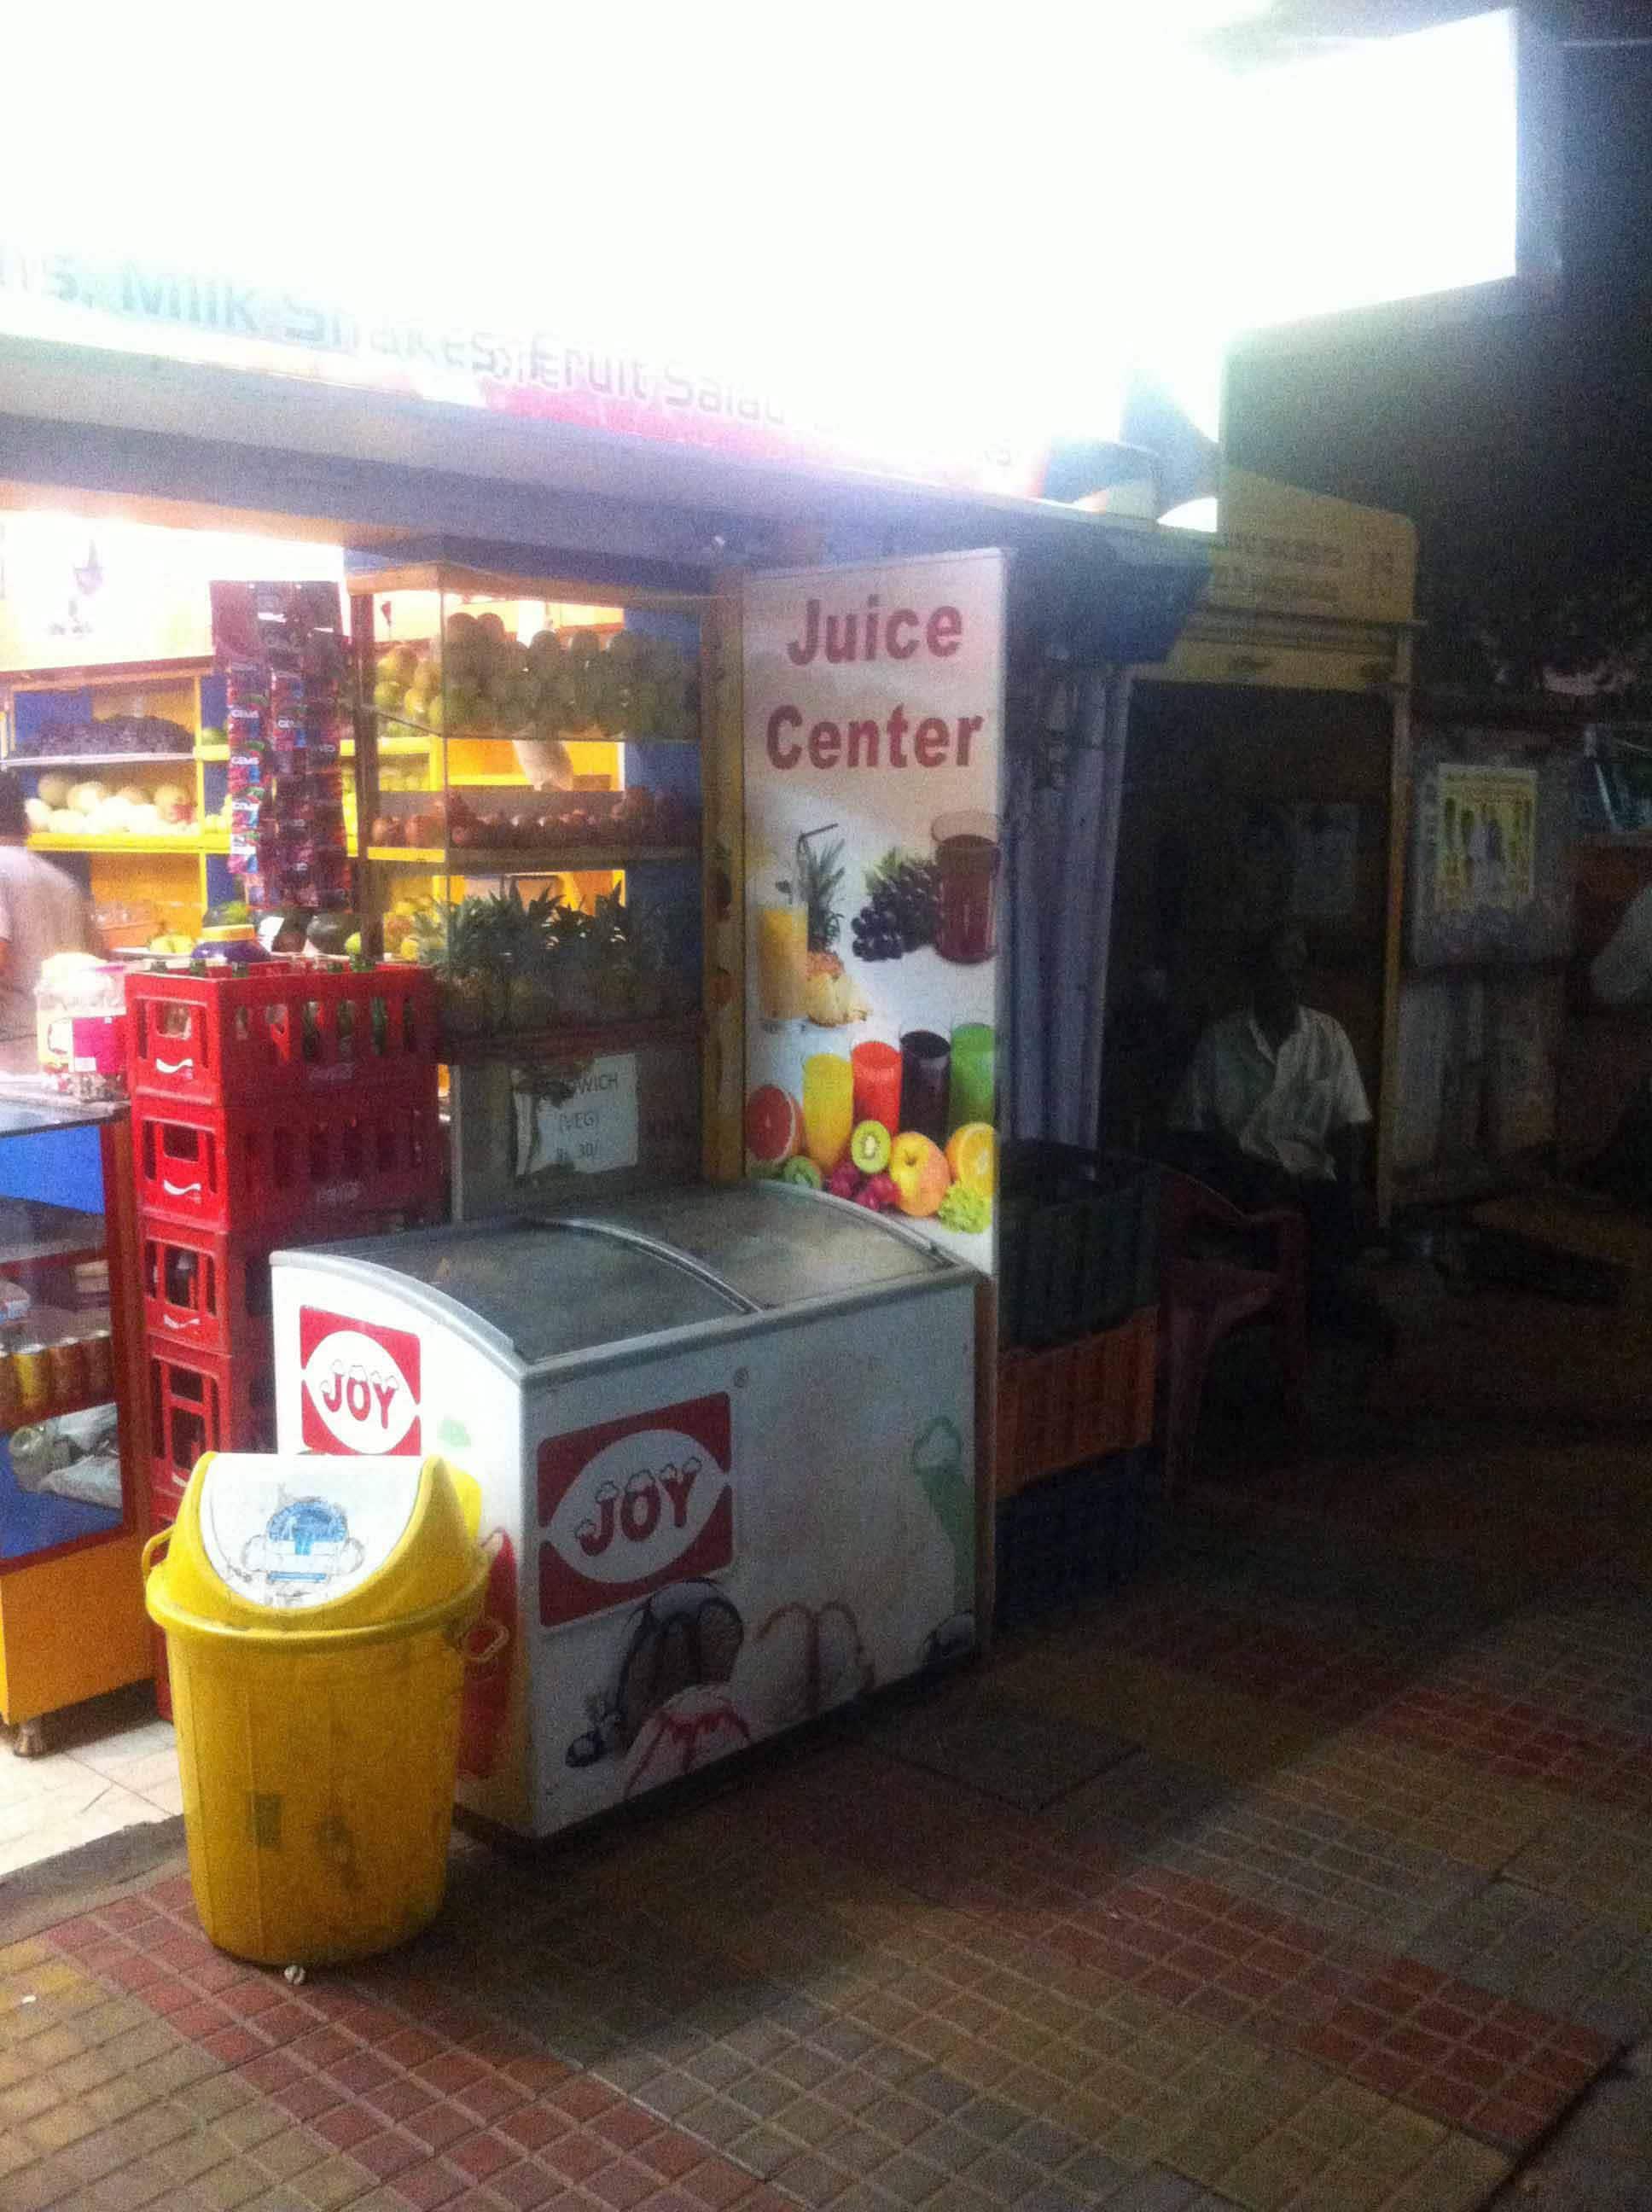 Sri Krishna Cool Center - Jayalakhsmipuram - Mysore Image